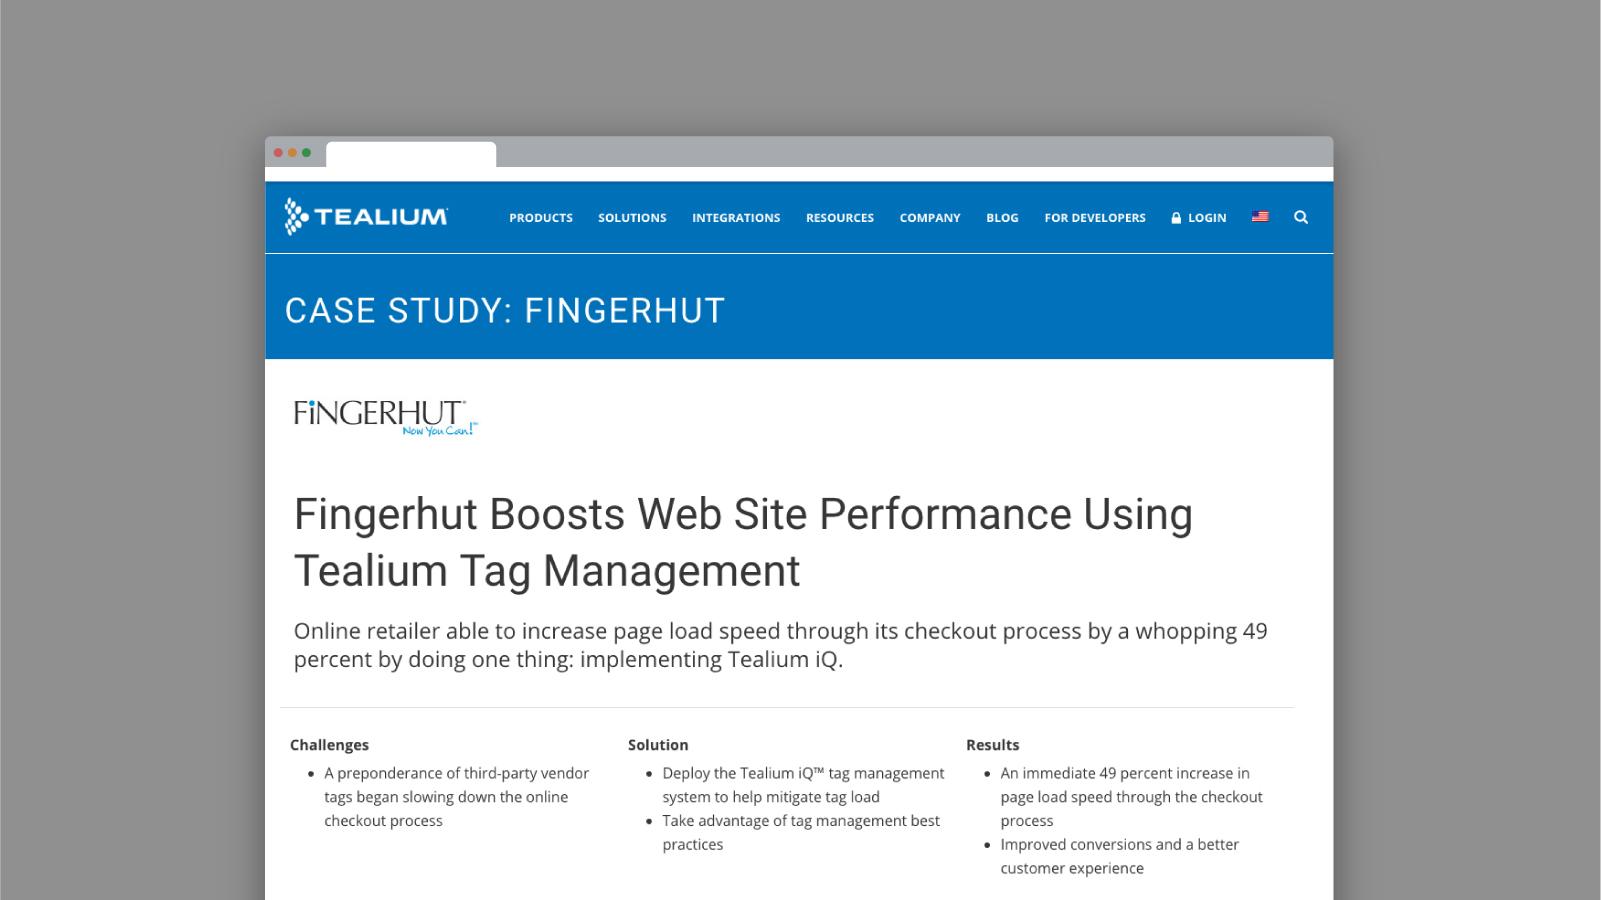 Tag Management System - Tealium IQ Enterprise Solutions